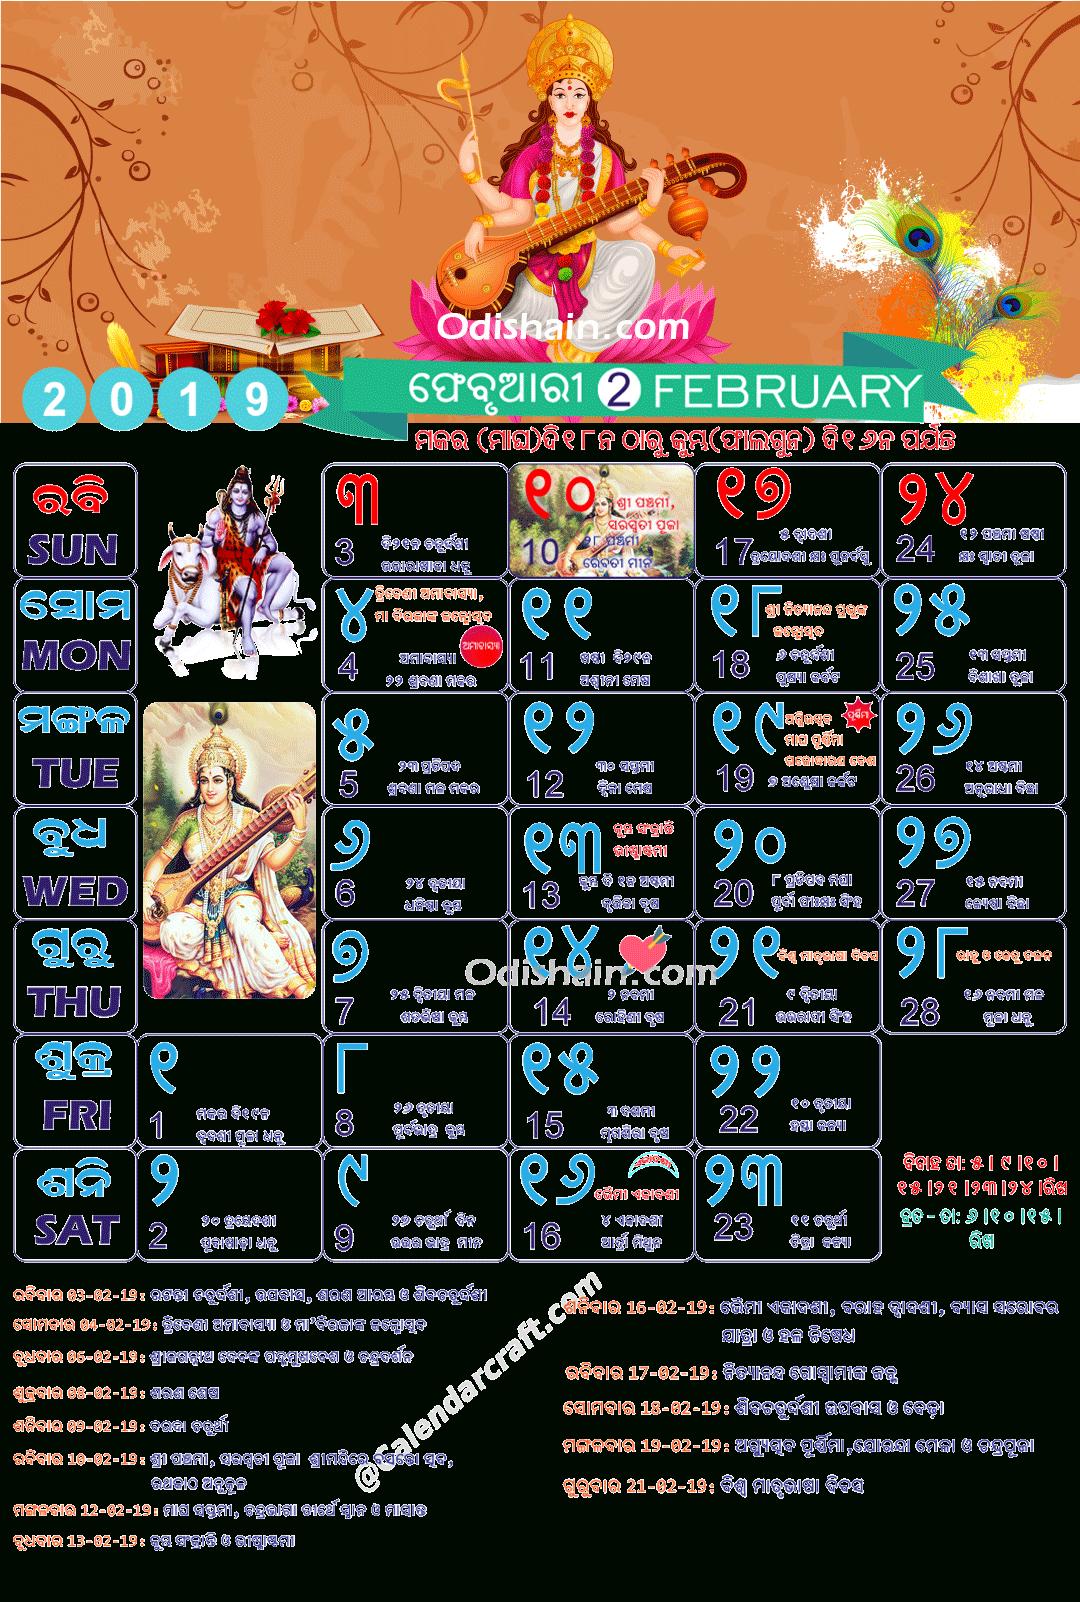 Odia Calendar 2019 Odia (Oriya) 2019 | Odishain for Odia Calendar February 2020